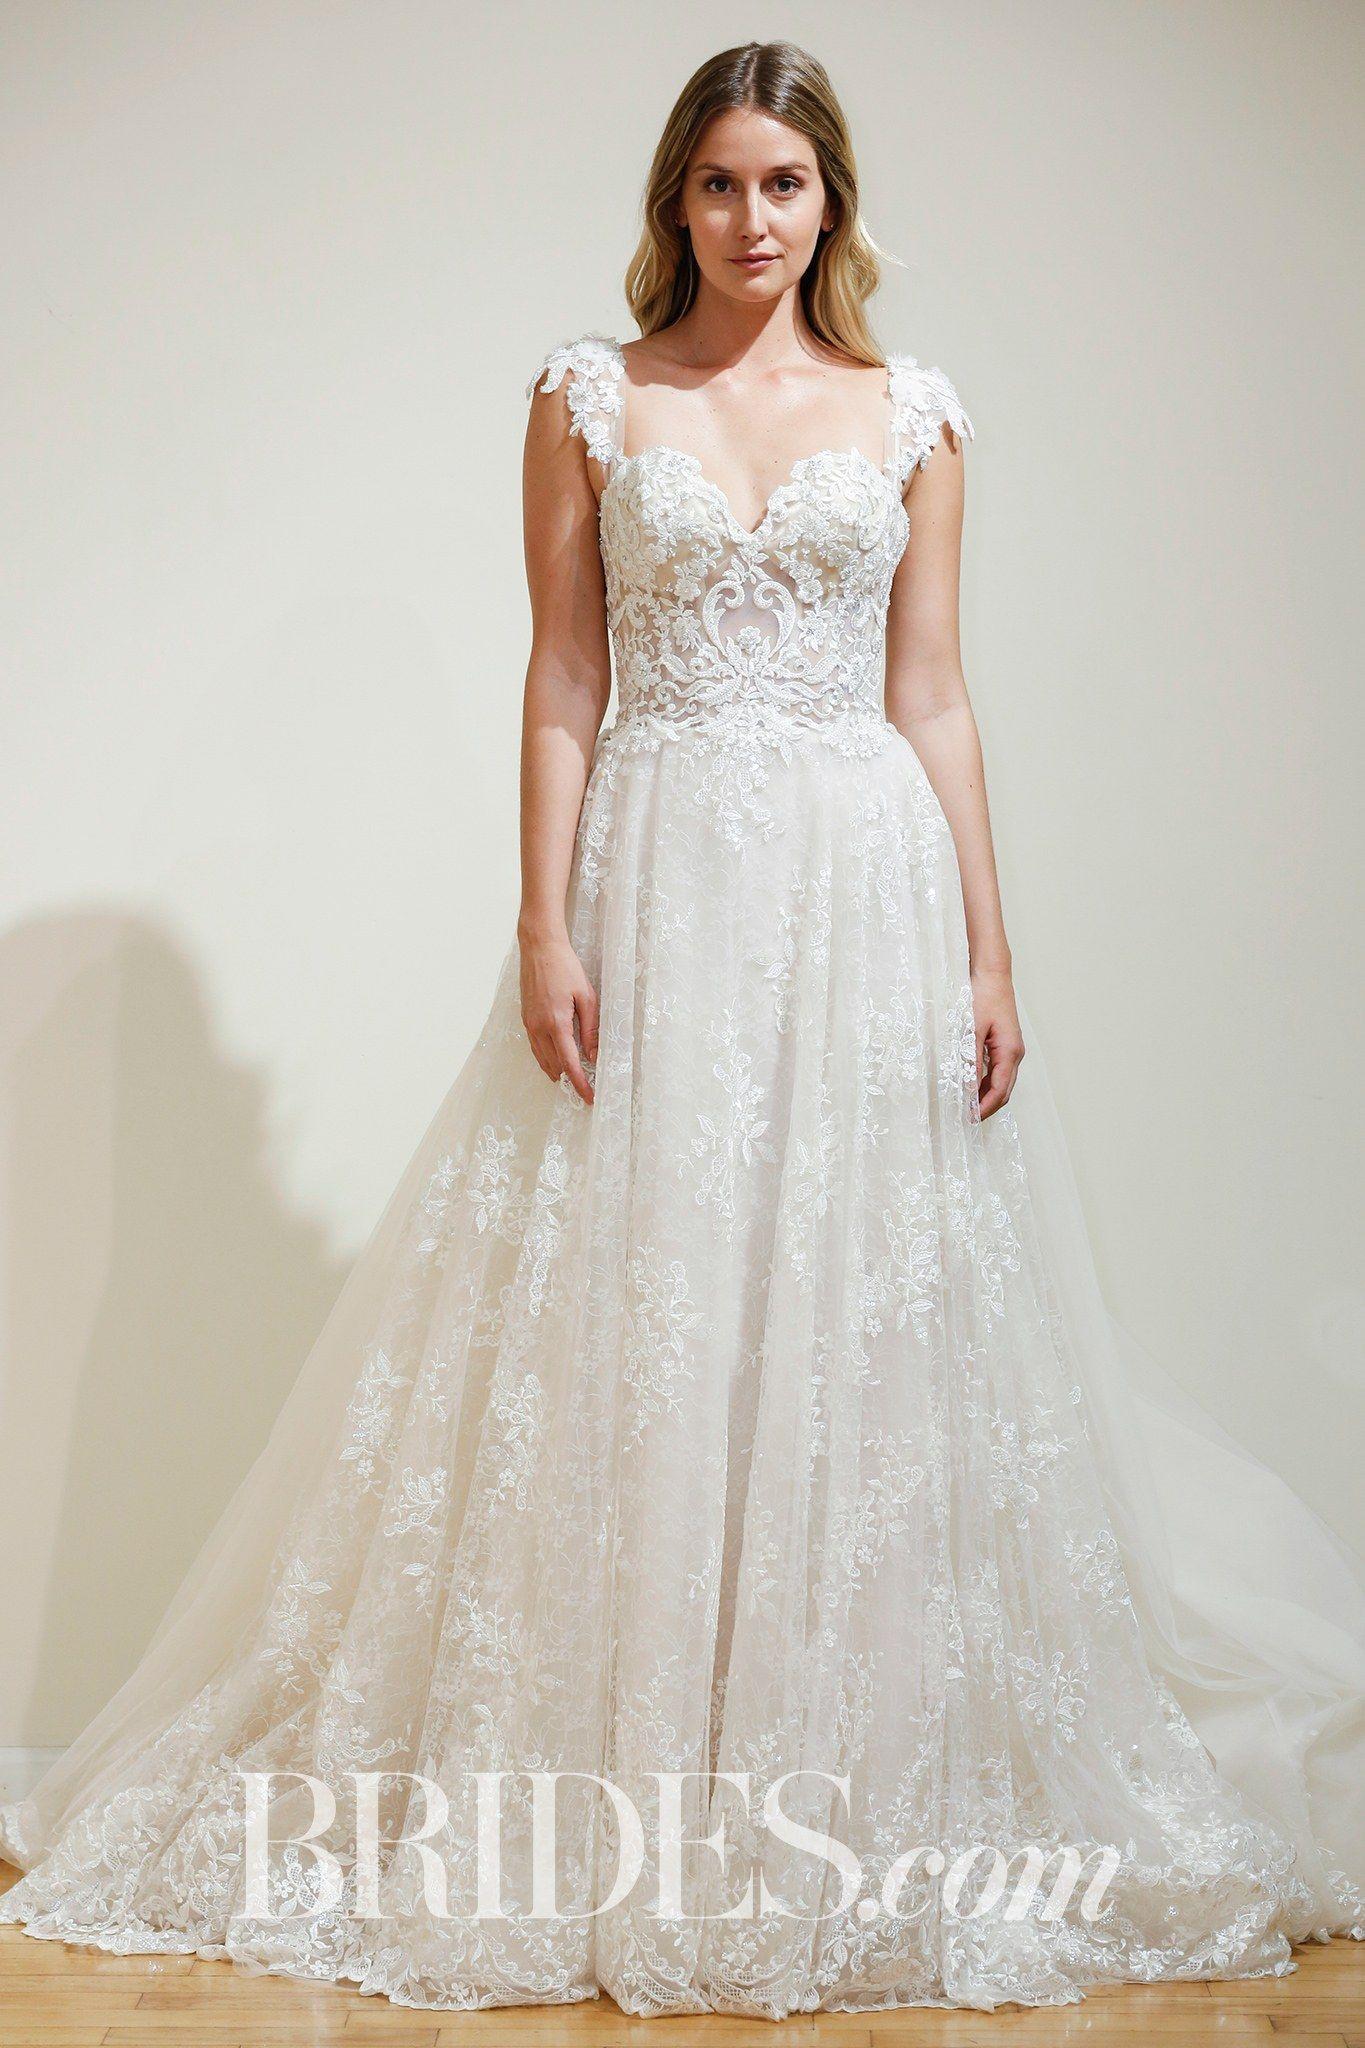 Buy Wedding Spring dresses pinterest pictures trends